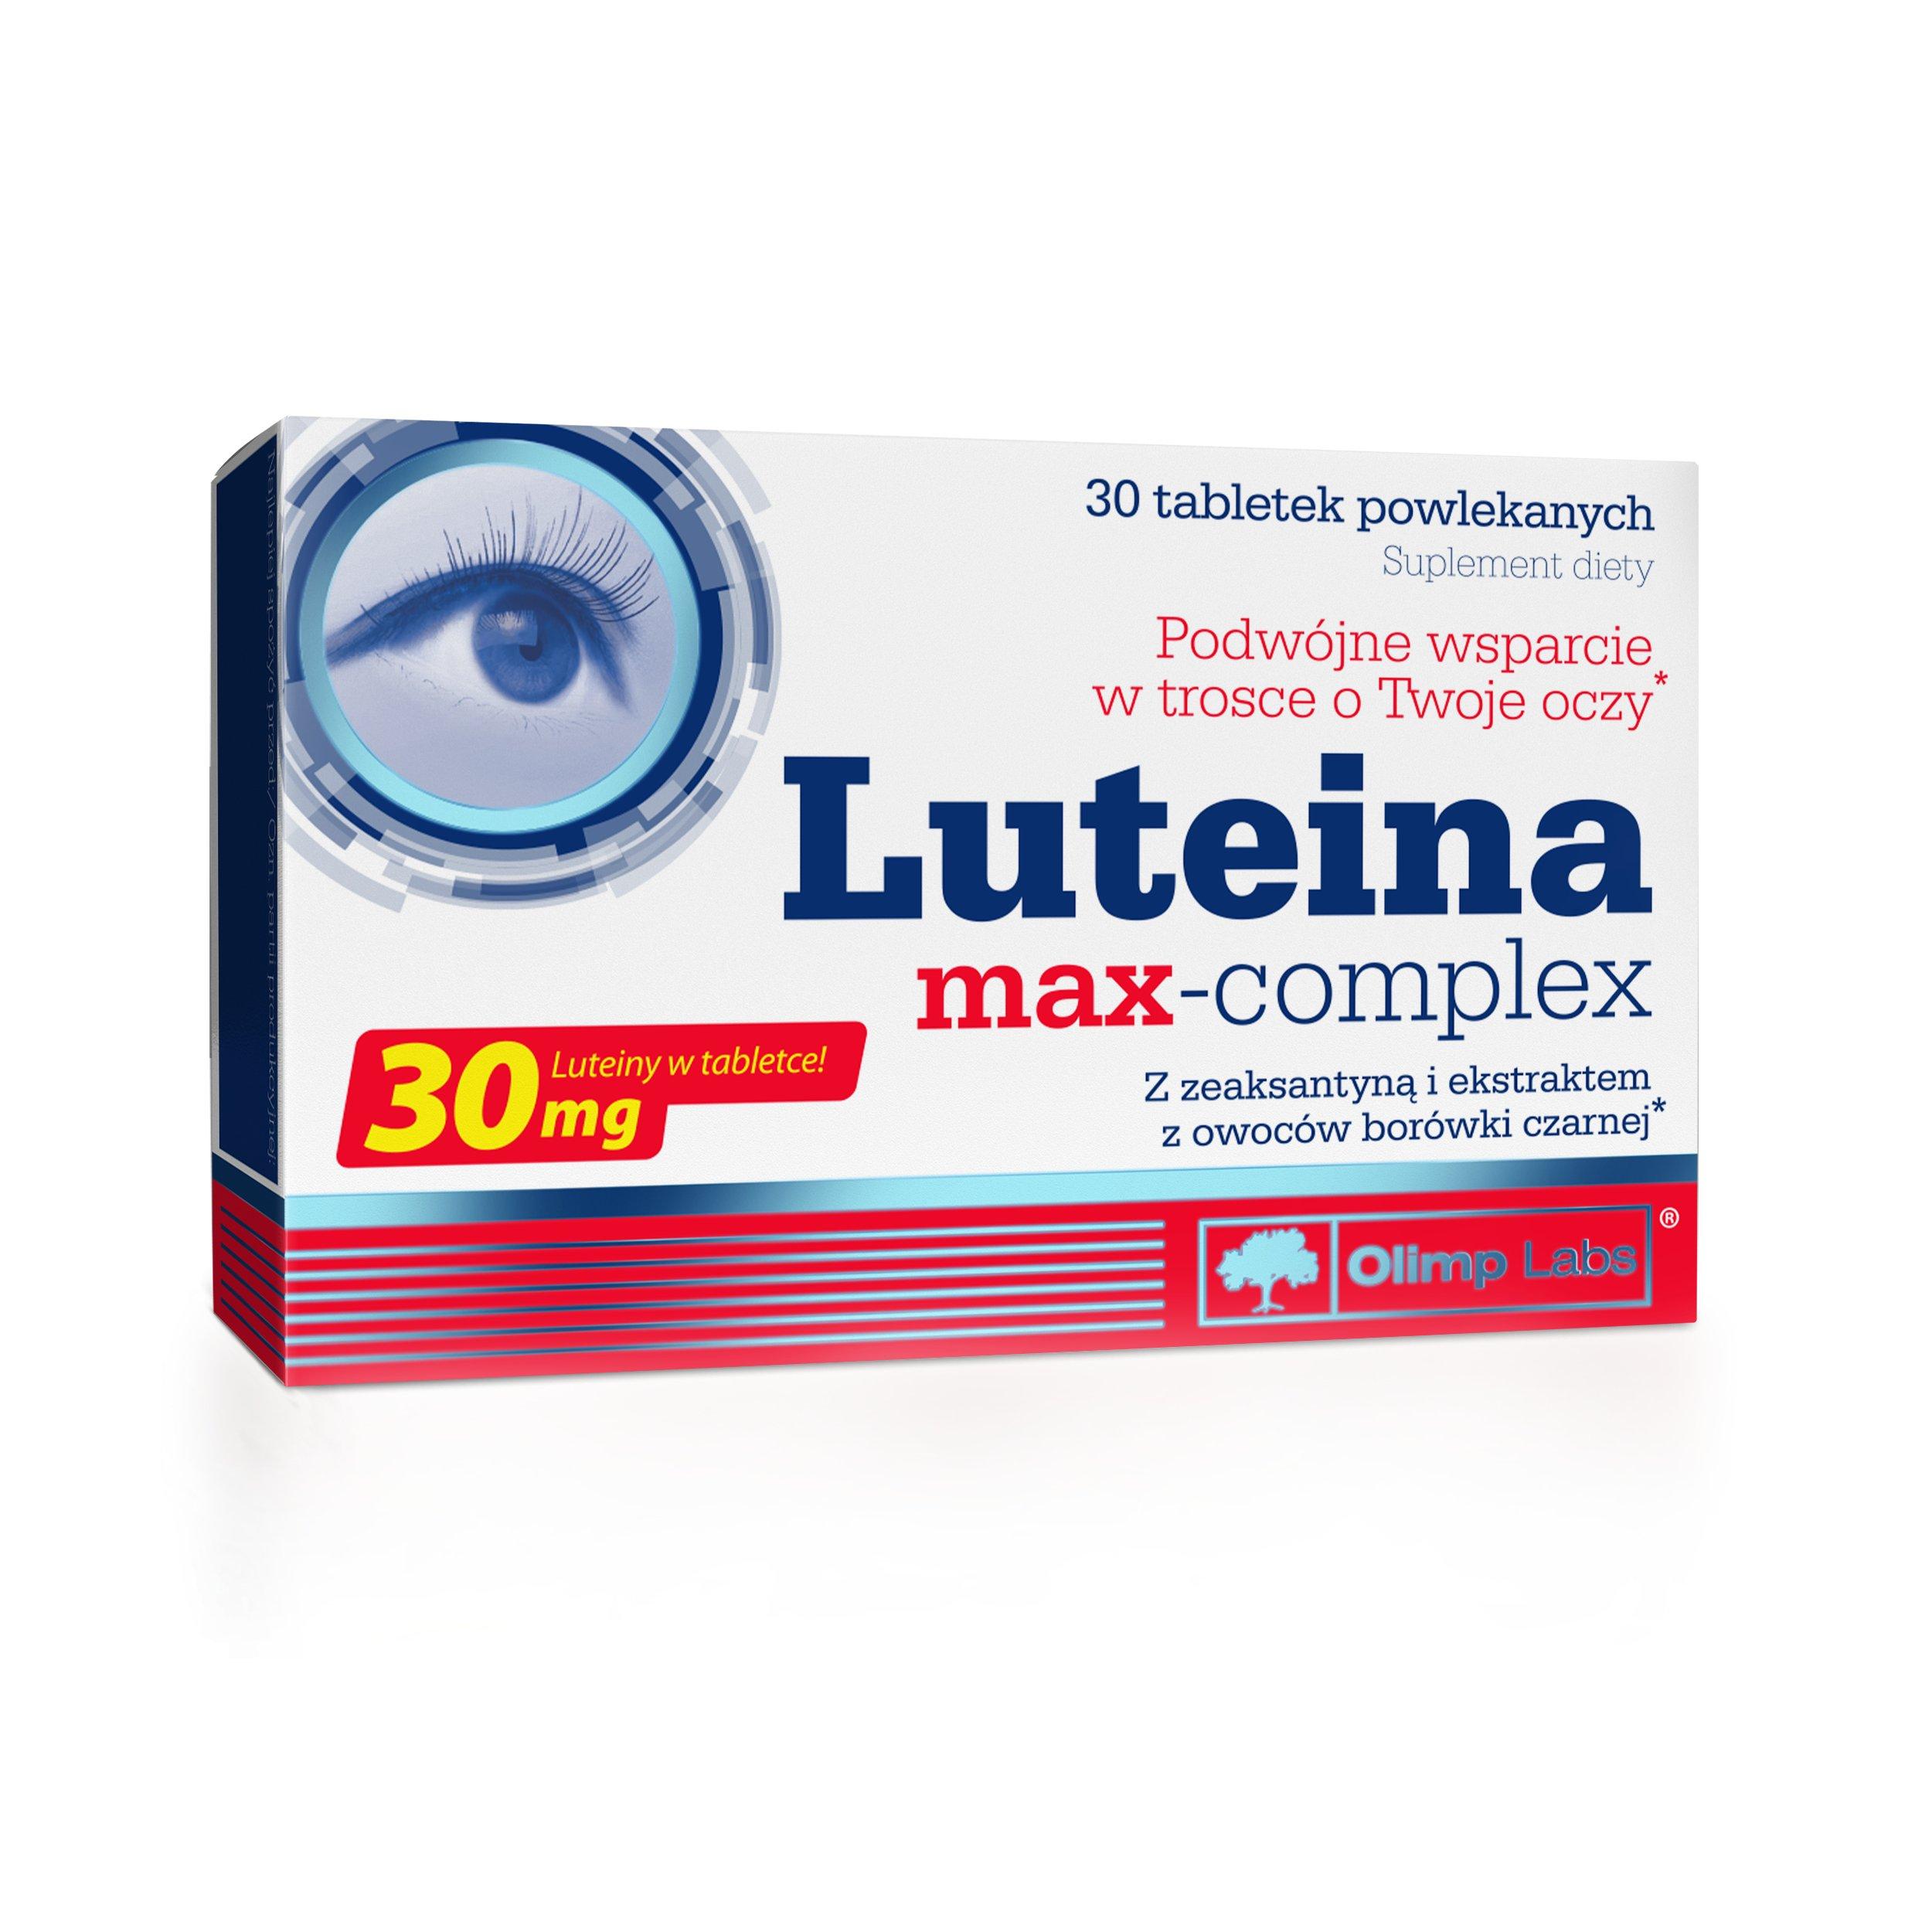 OLIMP LUTEINA MAX-COMPLEX 30tabl OCHRONA WZROKU